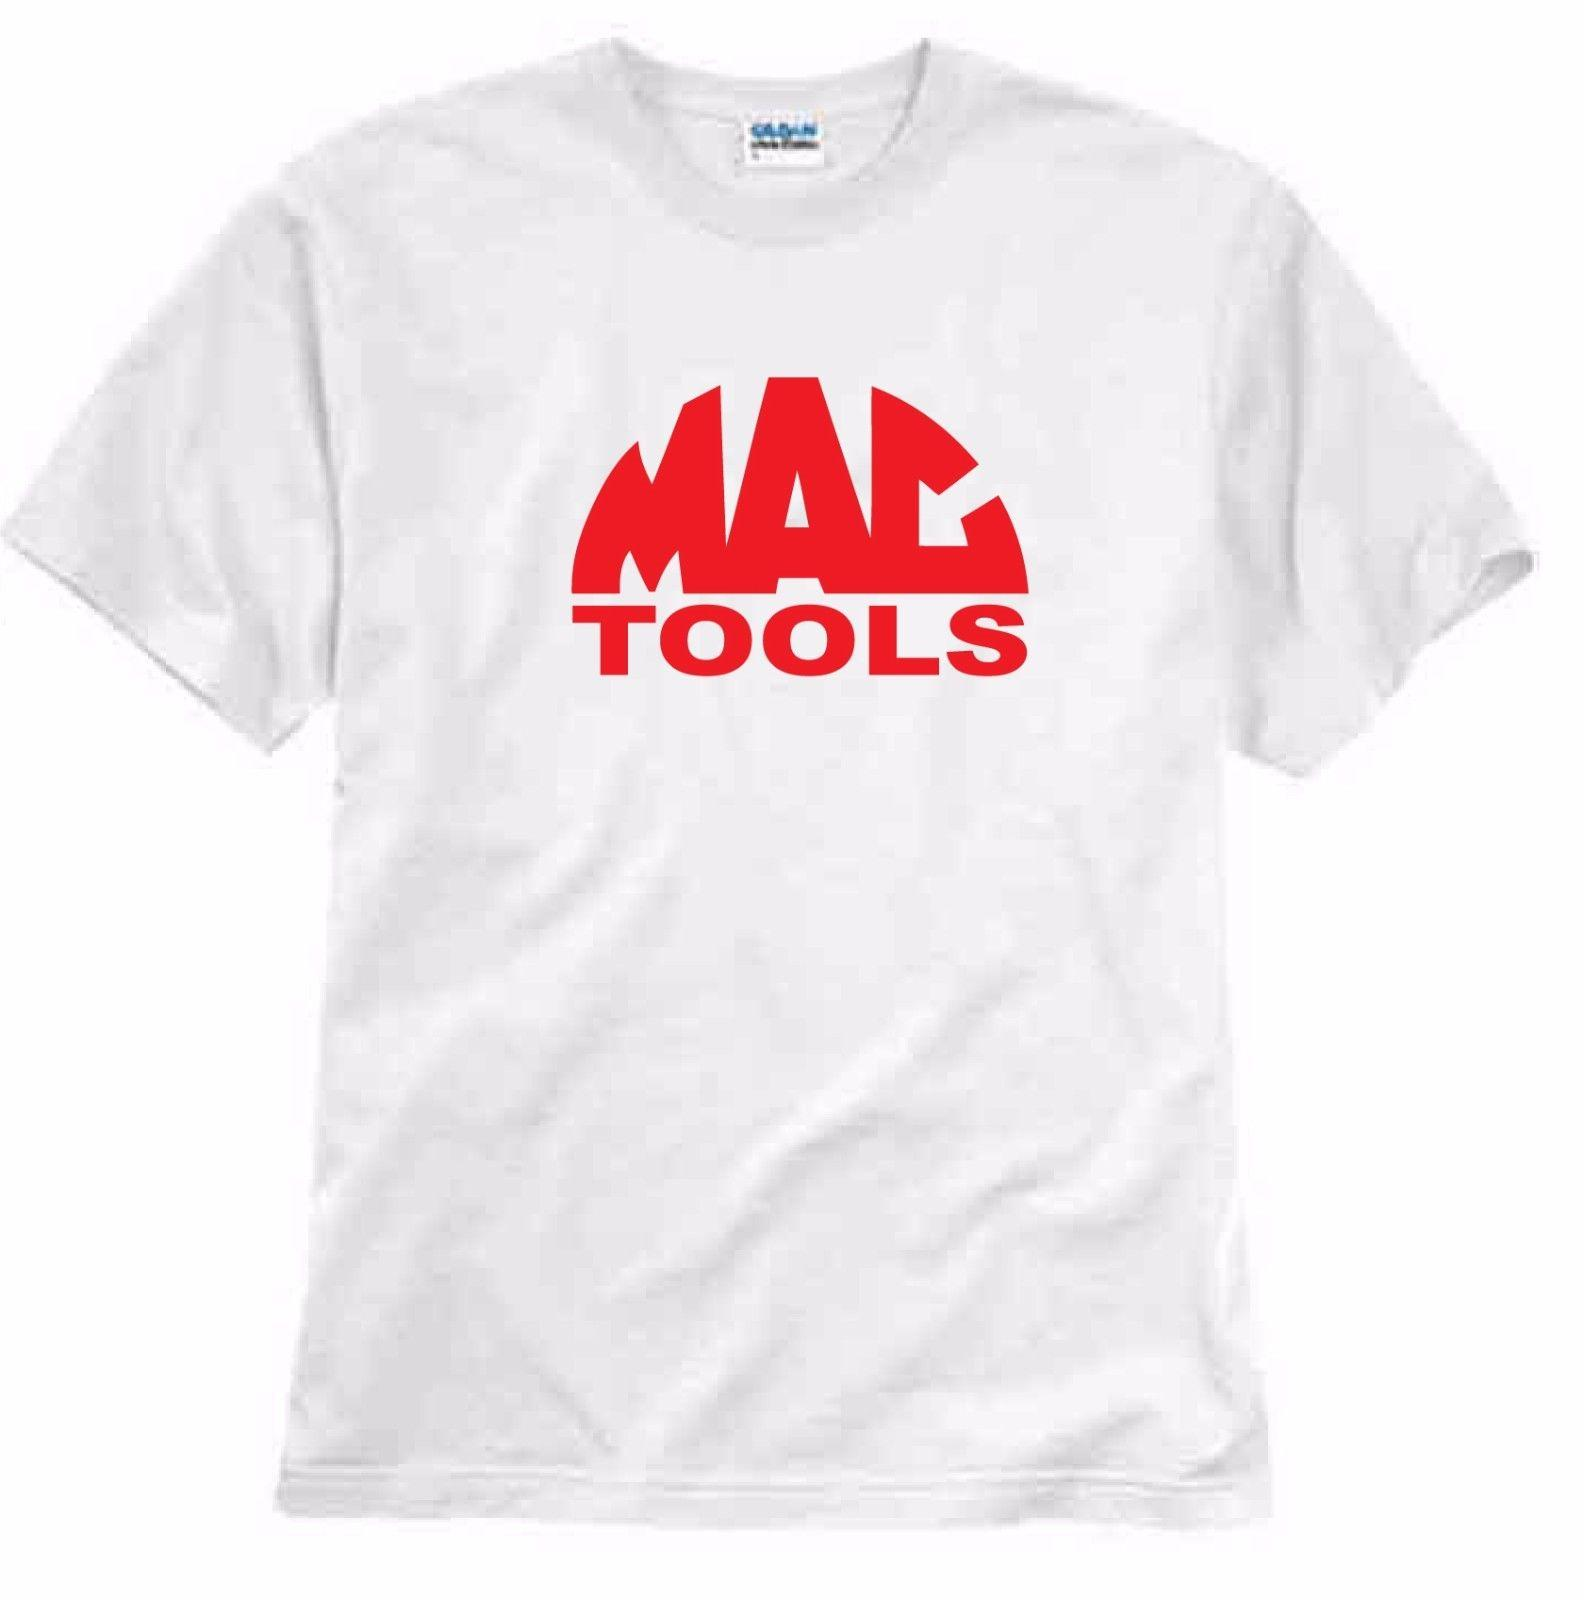 3dfd70c3e775 Mac Tools T Shirt Cool Fun Tee Mechanics Truckers Cars Dad Gift Idea  Fathers Day Top Tee Summer Fashion T Shirt T Shirts With Sayings Awesome T  Shirt ...